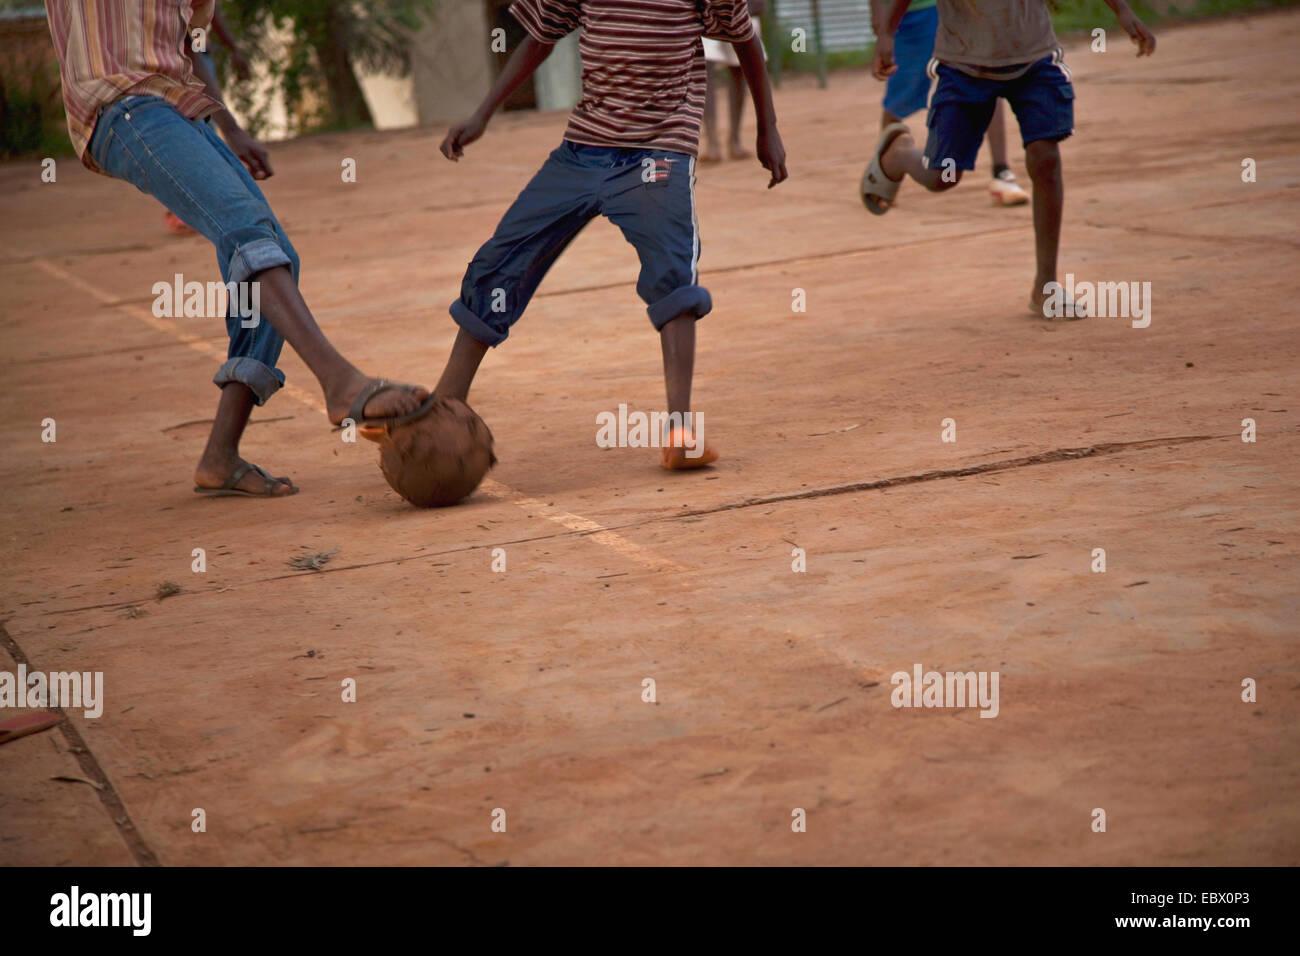 Adolescents playing soccer - football on a concrete area, Rwanda, Nyamirambo, Kigali - Stock Image